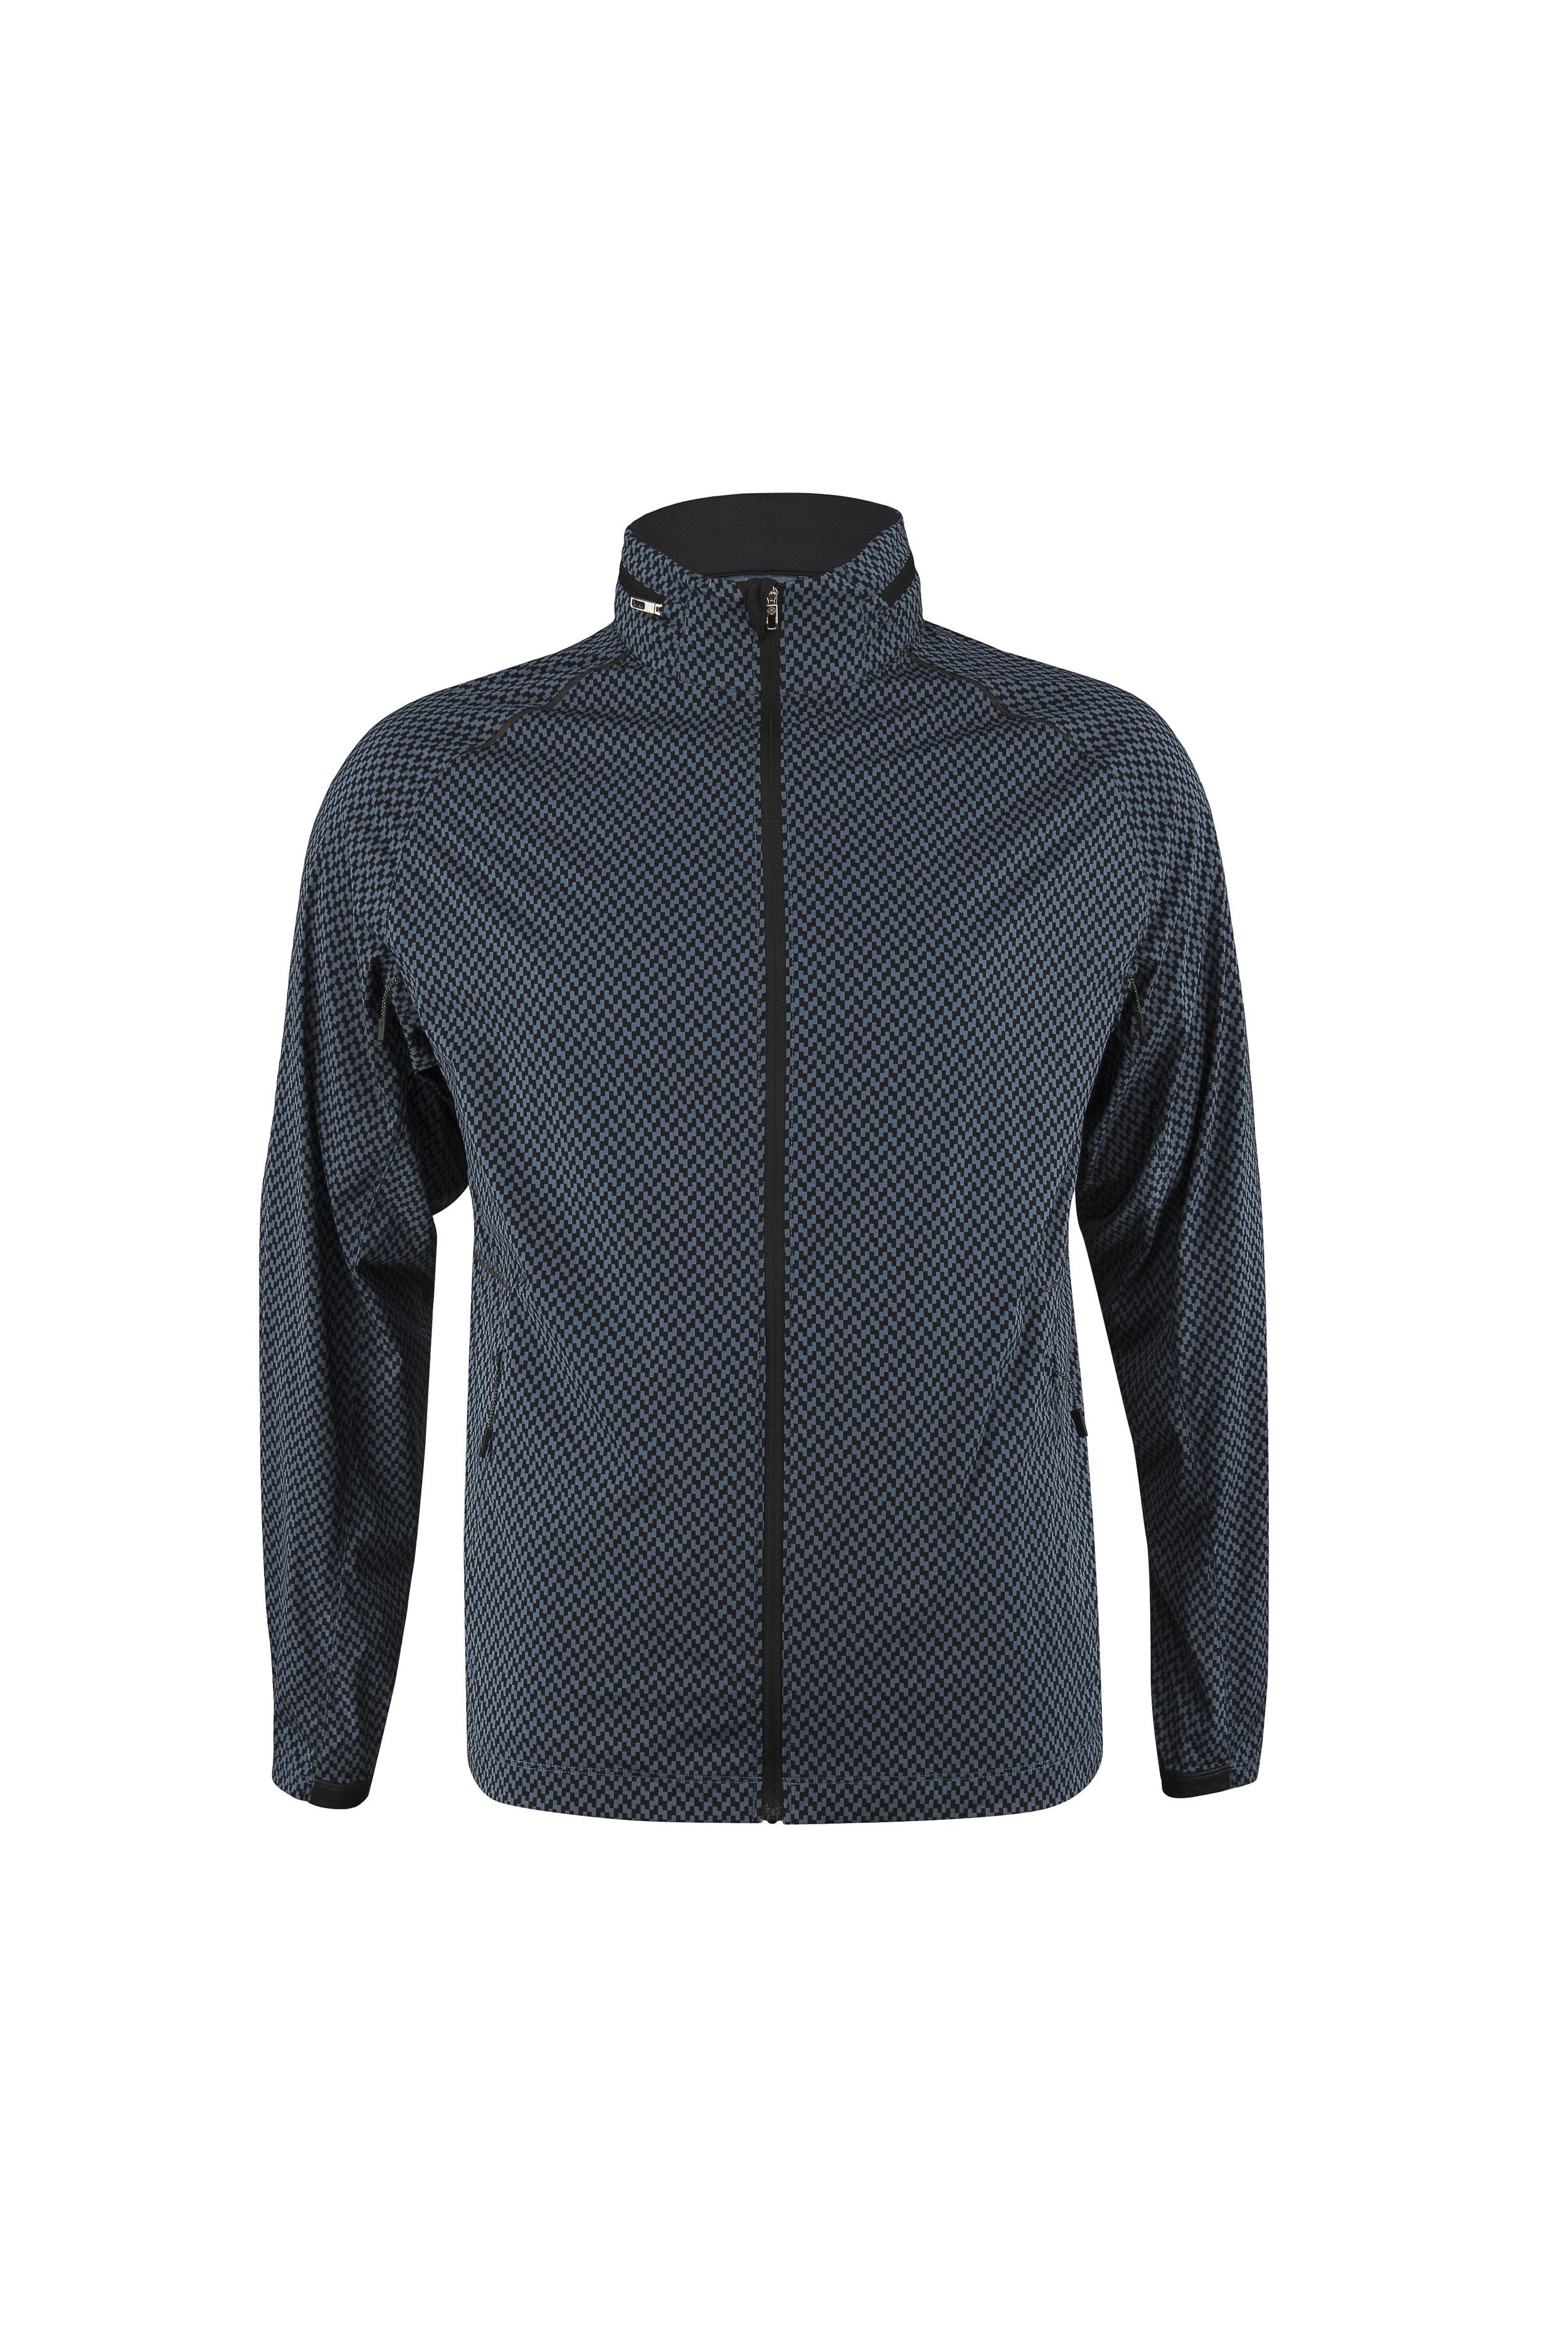 lululemon Surge Jacket